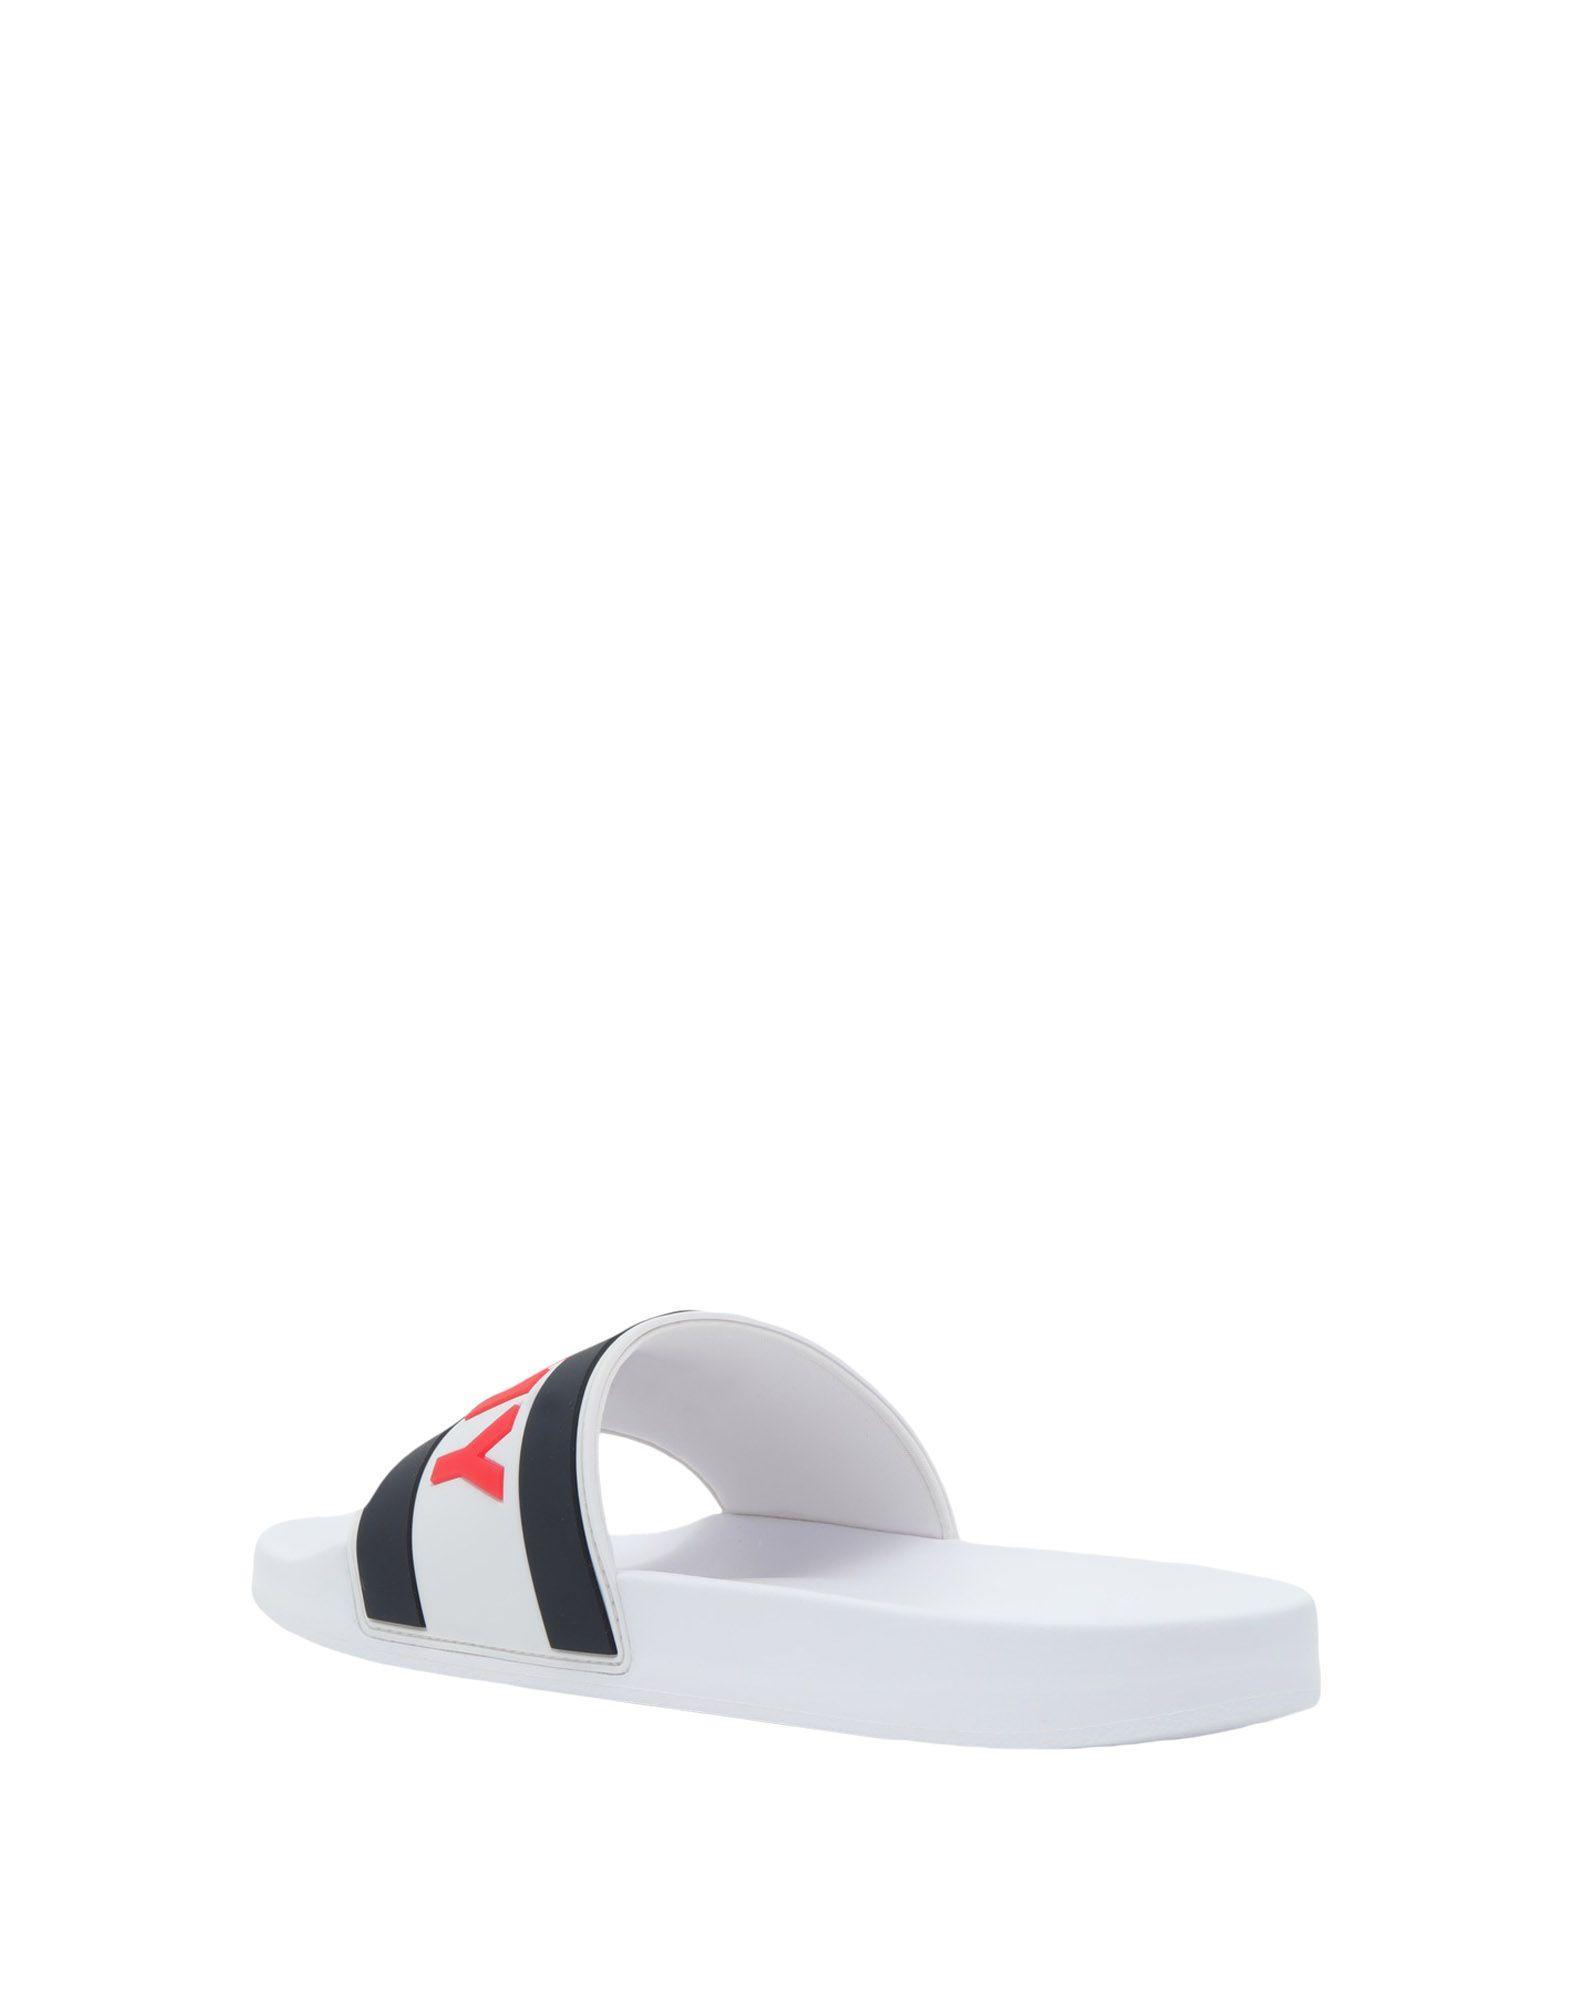 6e9d27d1cef Lyst - Tommy Hilfiger Sandals in White for Men